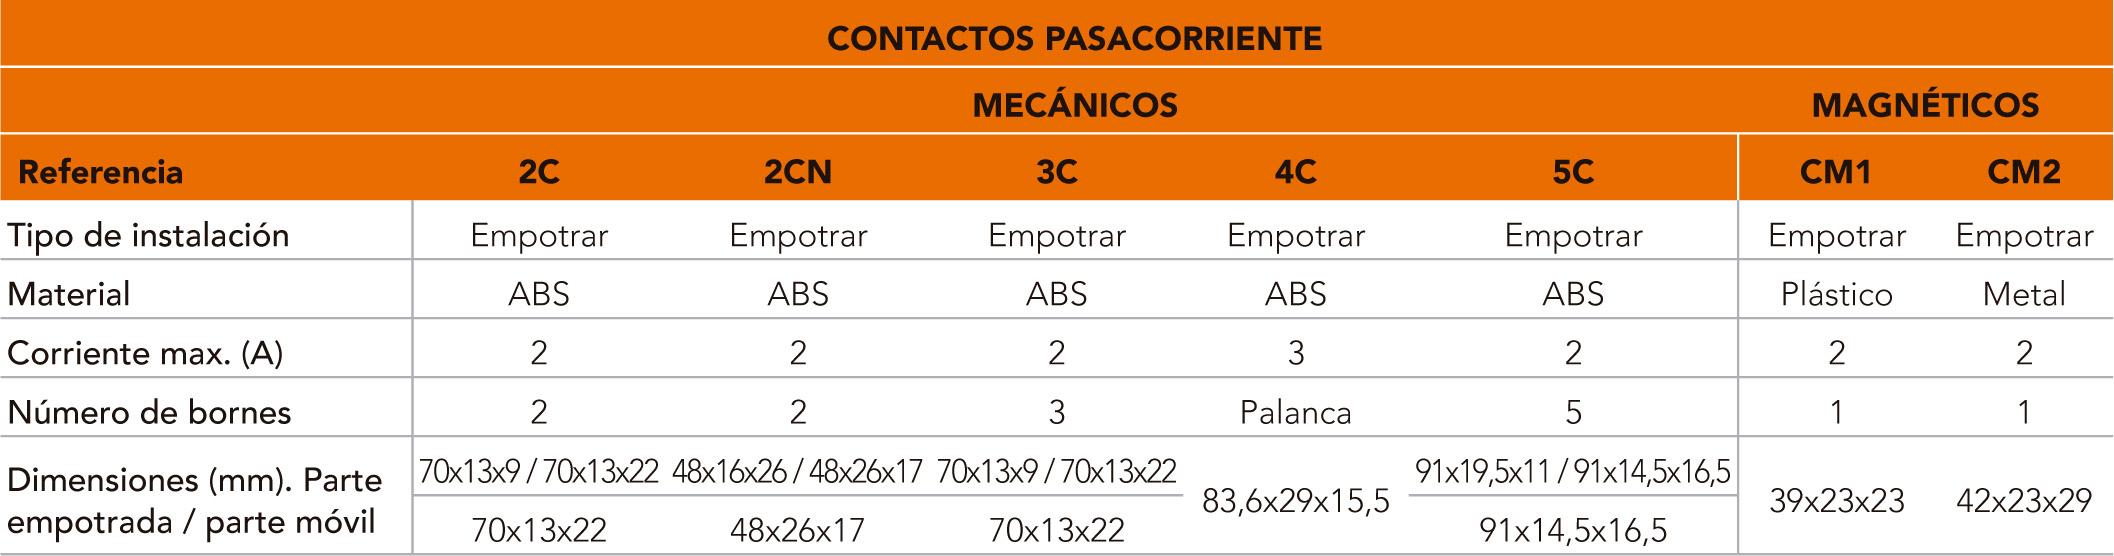 contactos_caracteristicas